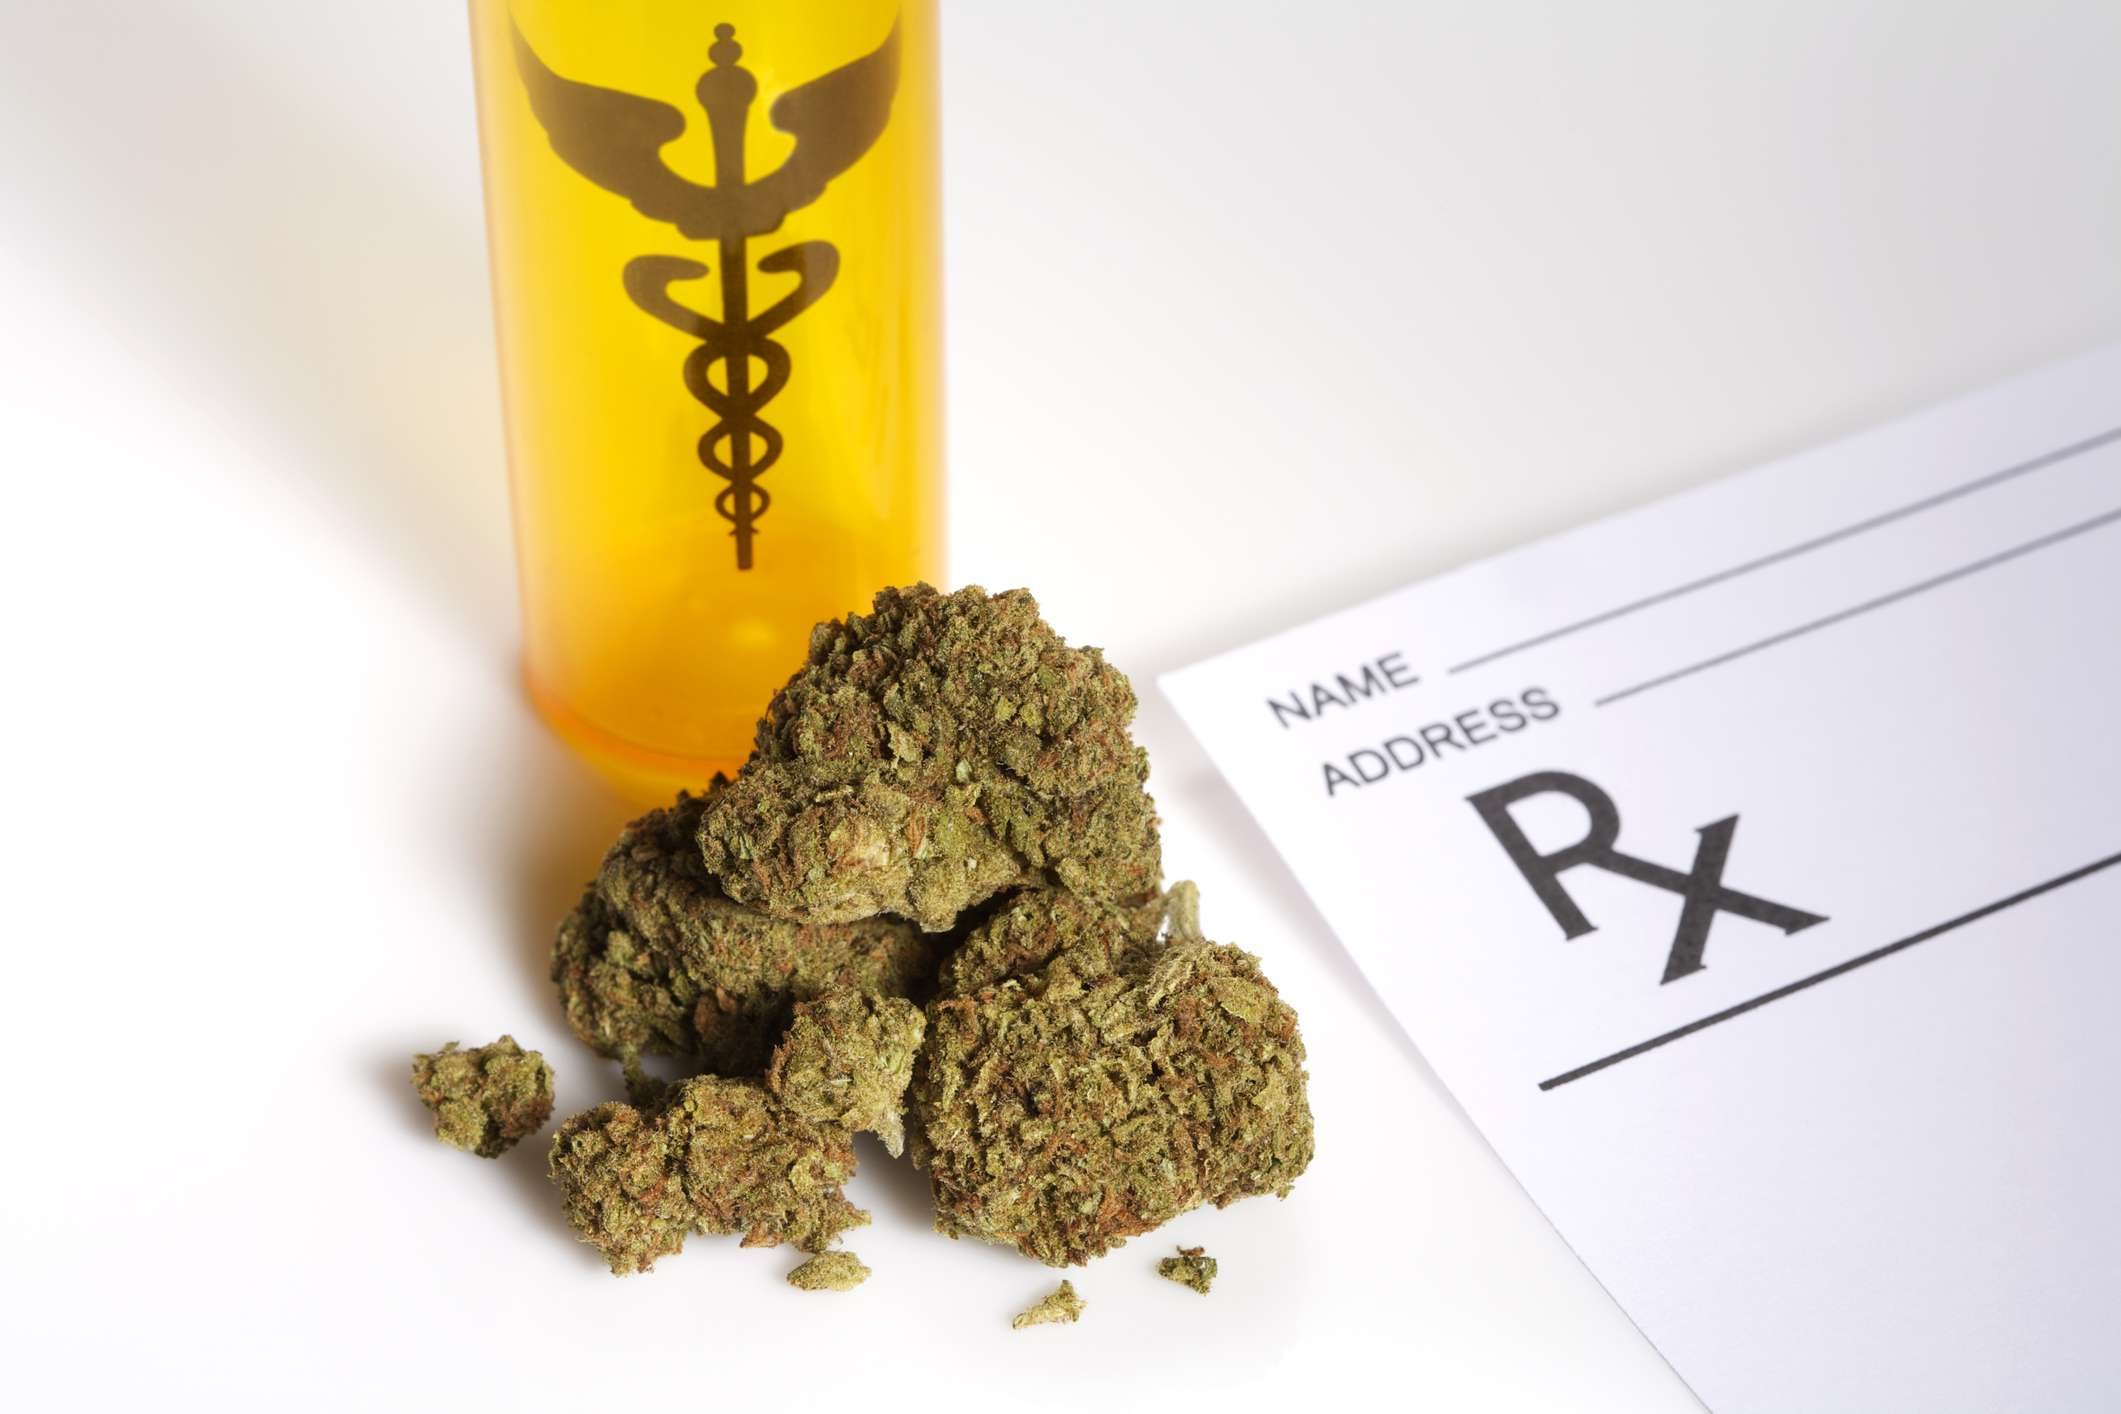 Medical marijuana on a white surface